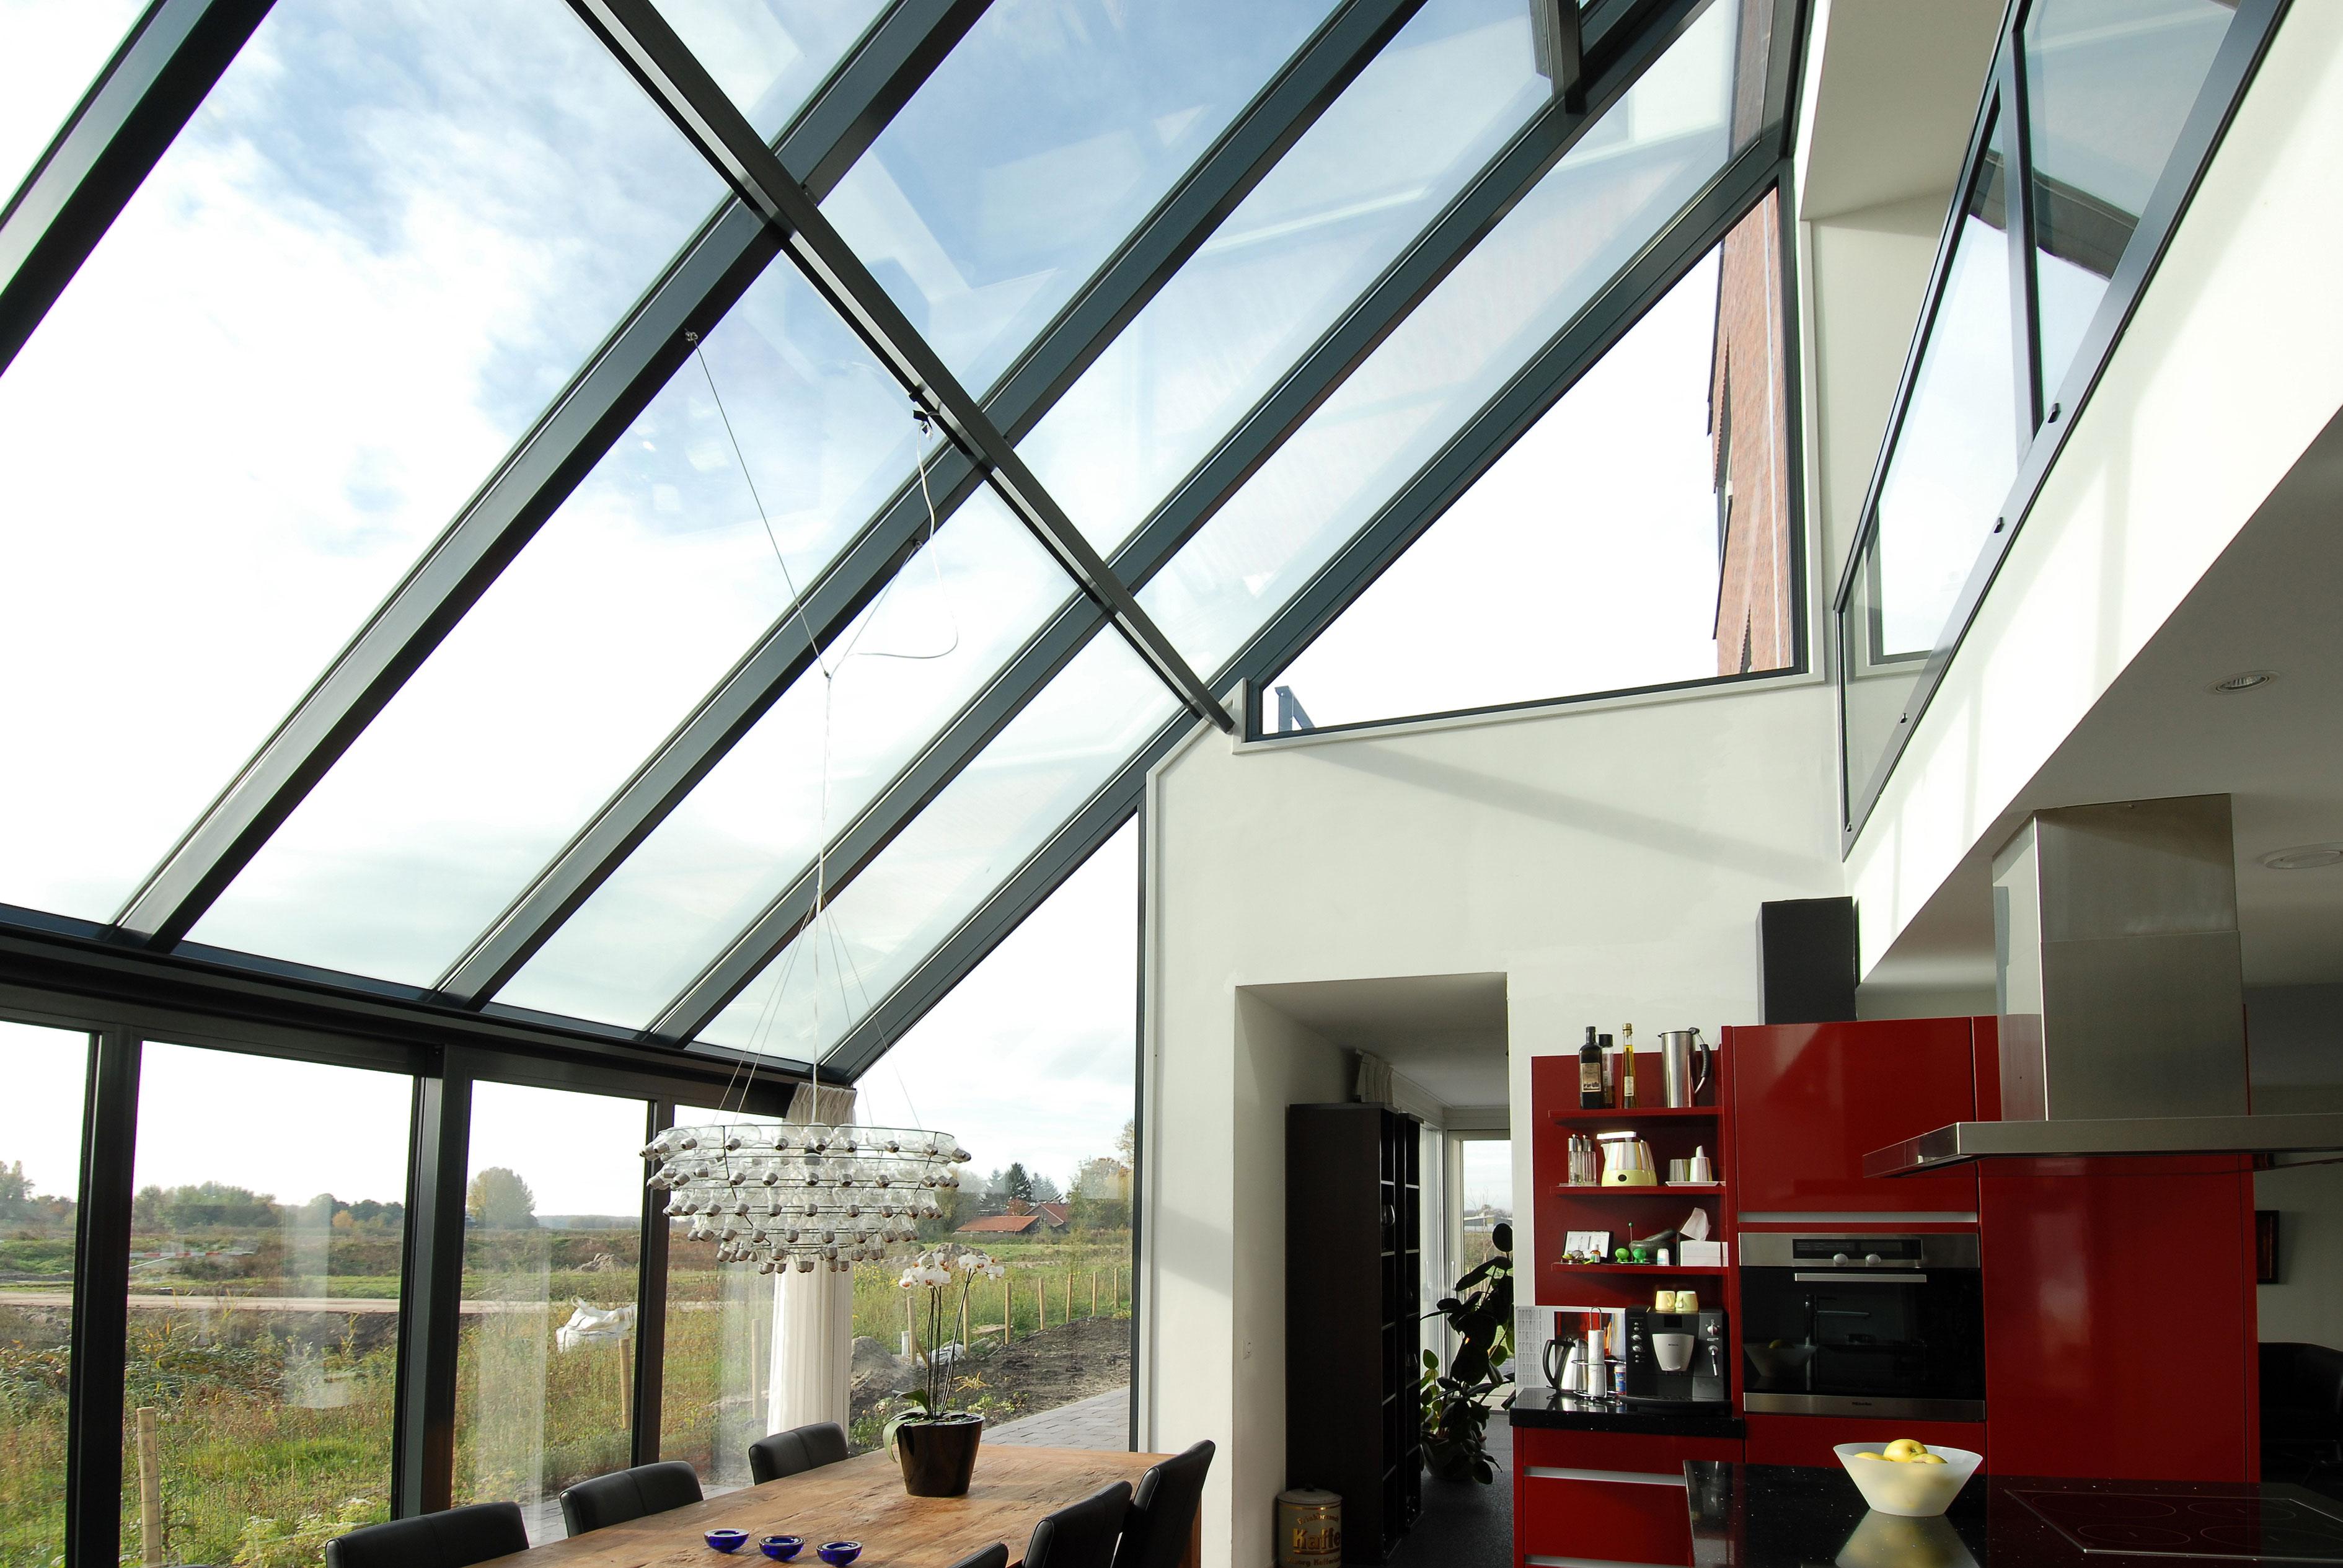 silding doors and roof windows & Combining sliding folding doors with roof windows - Reynaers At Home